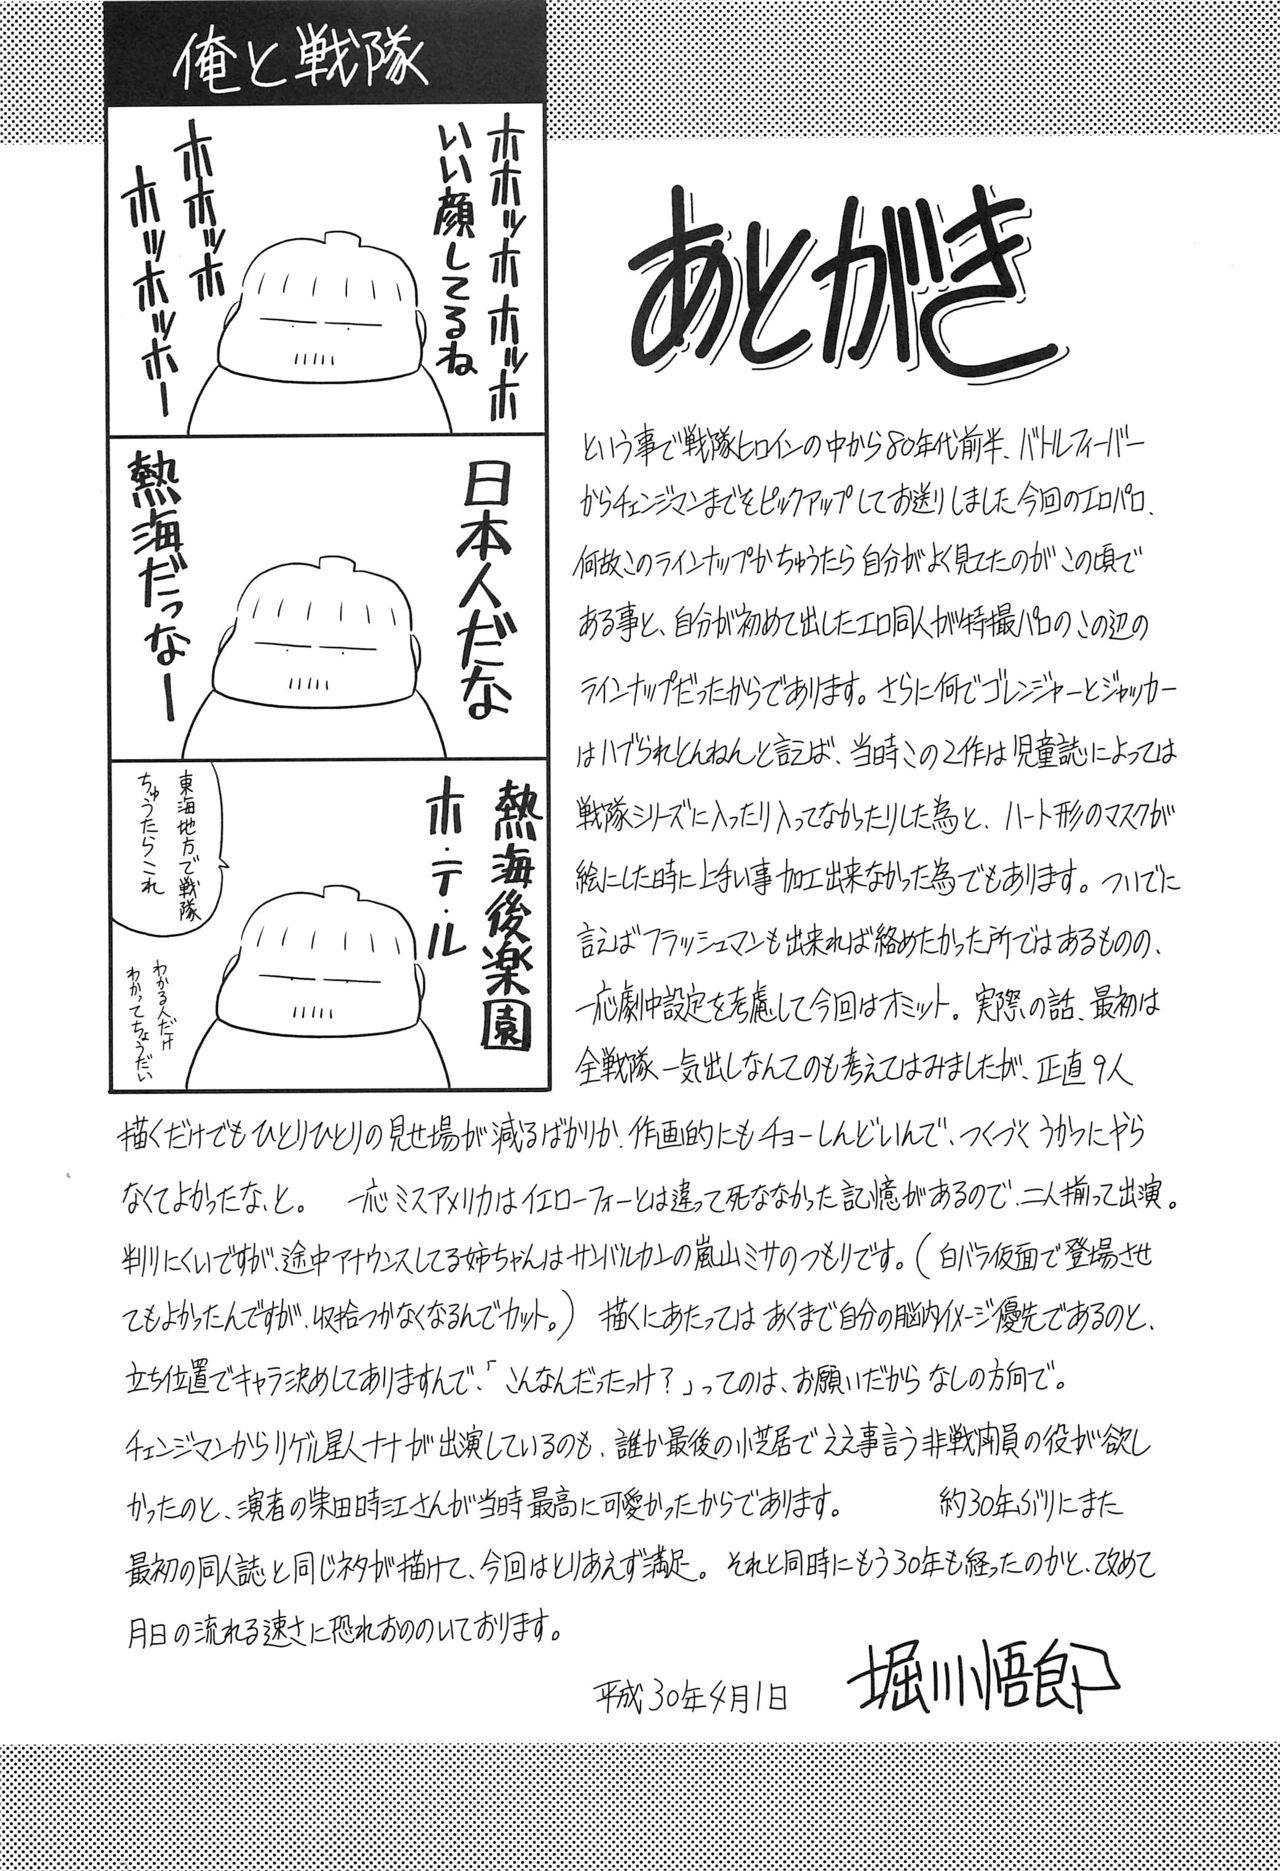 <<Tokusatsu>> Superheroine Sentai 80's 57